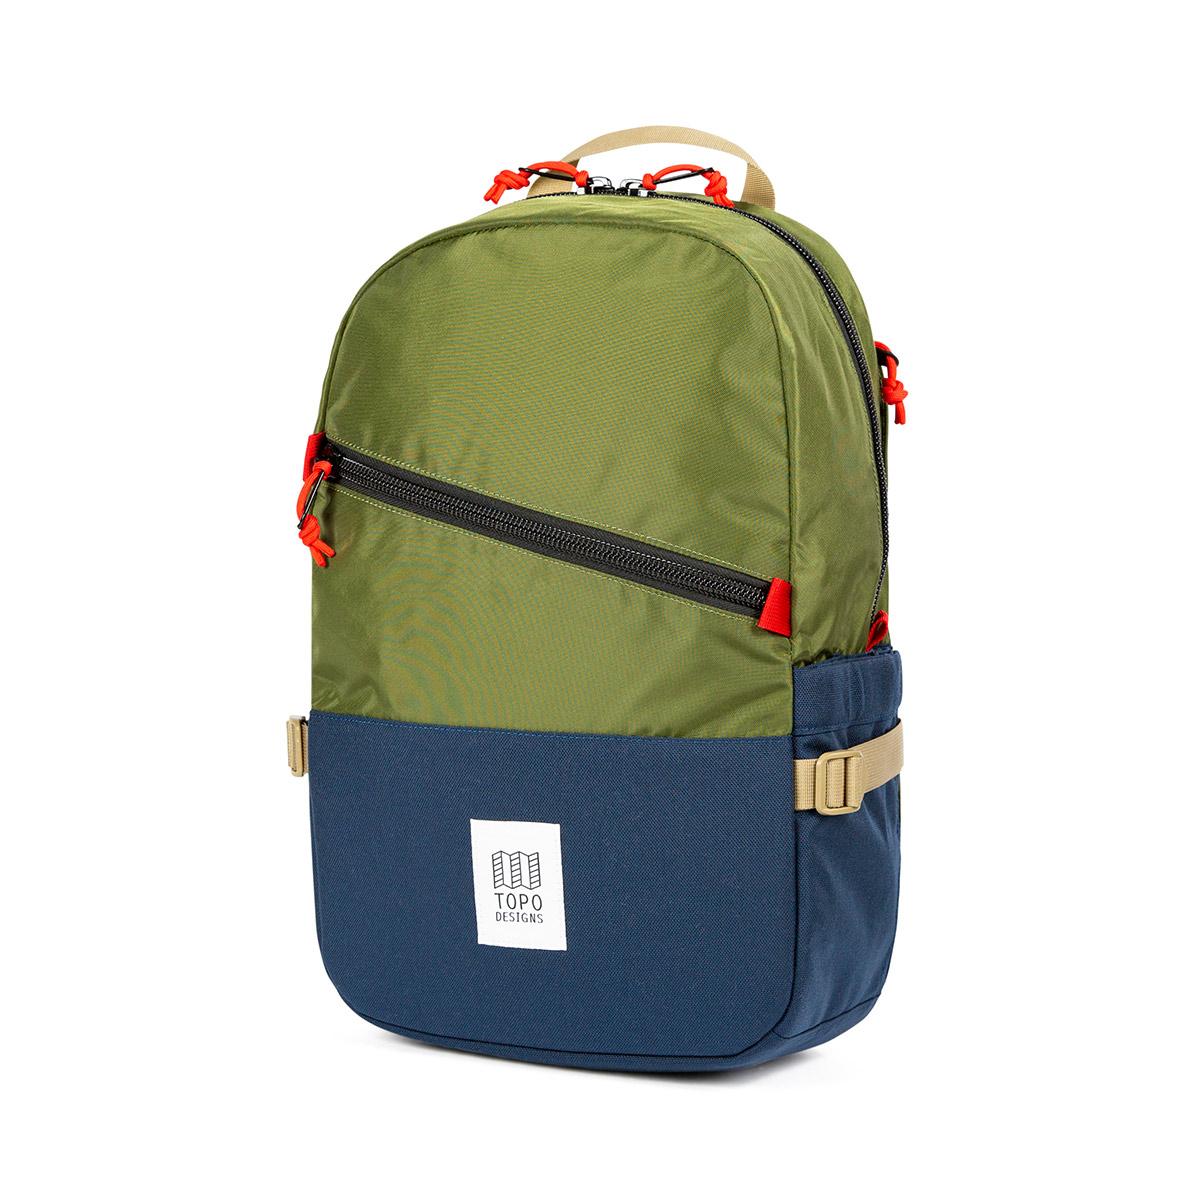 Topo Designs Standard Pack Olive/Navy